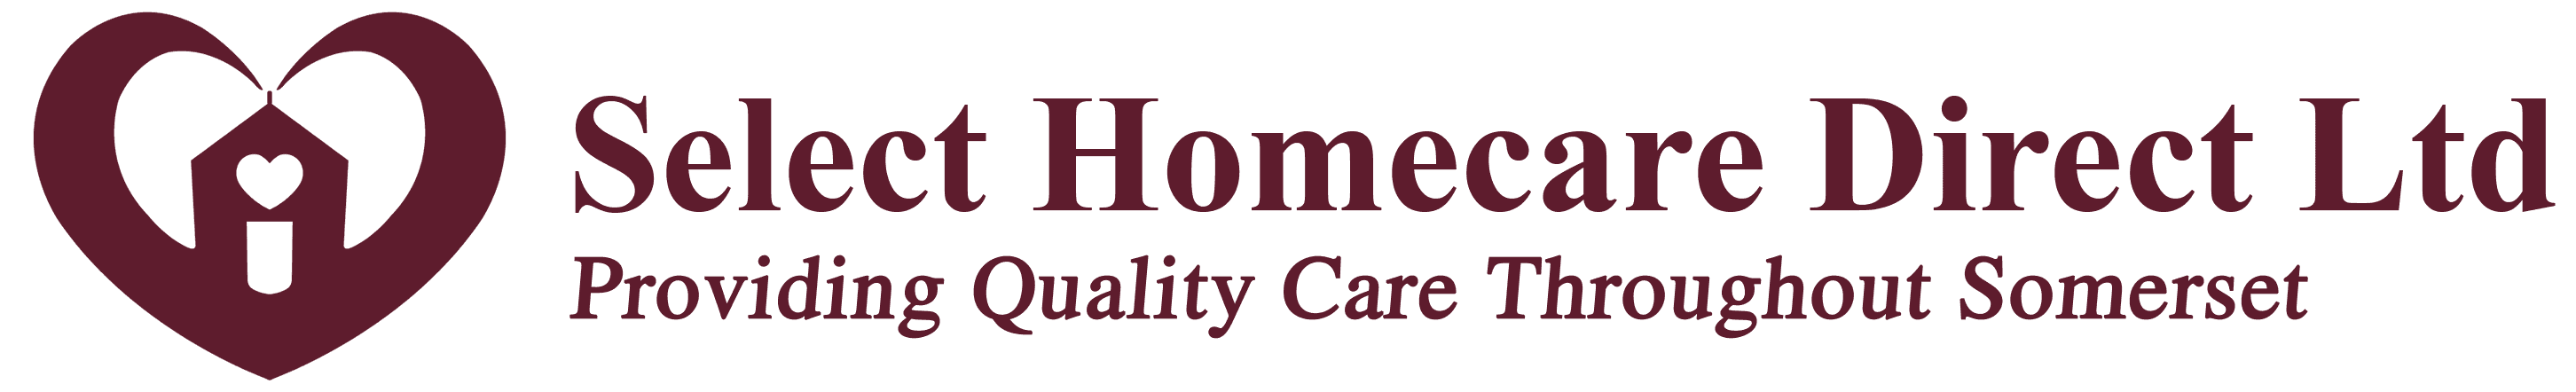 Select Homecare Direct Ltd company logo